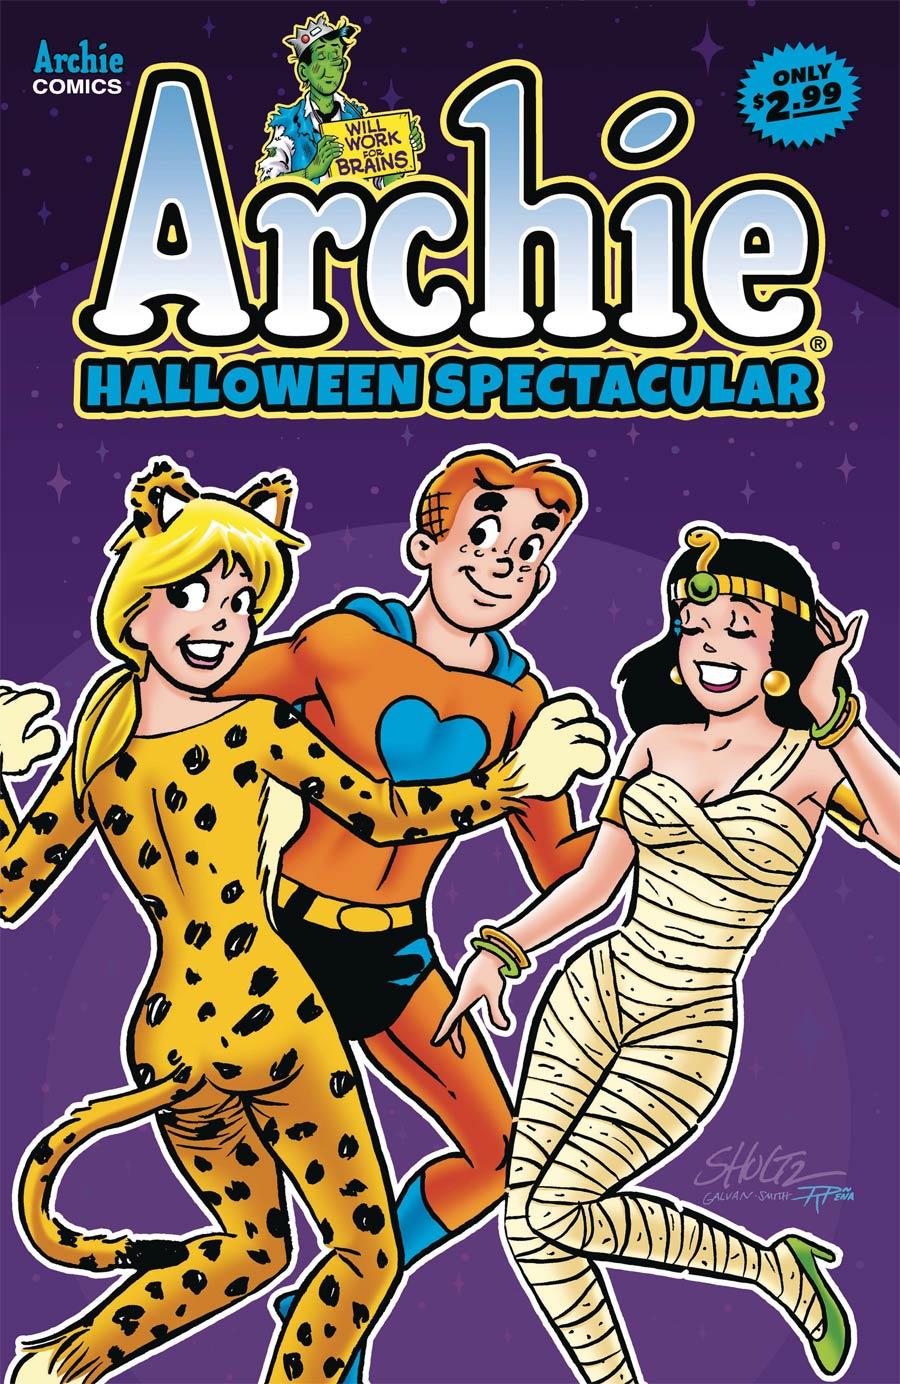 Archies Halloween Spectacular #1 2020